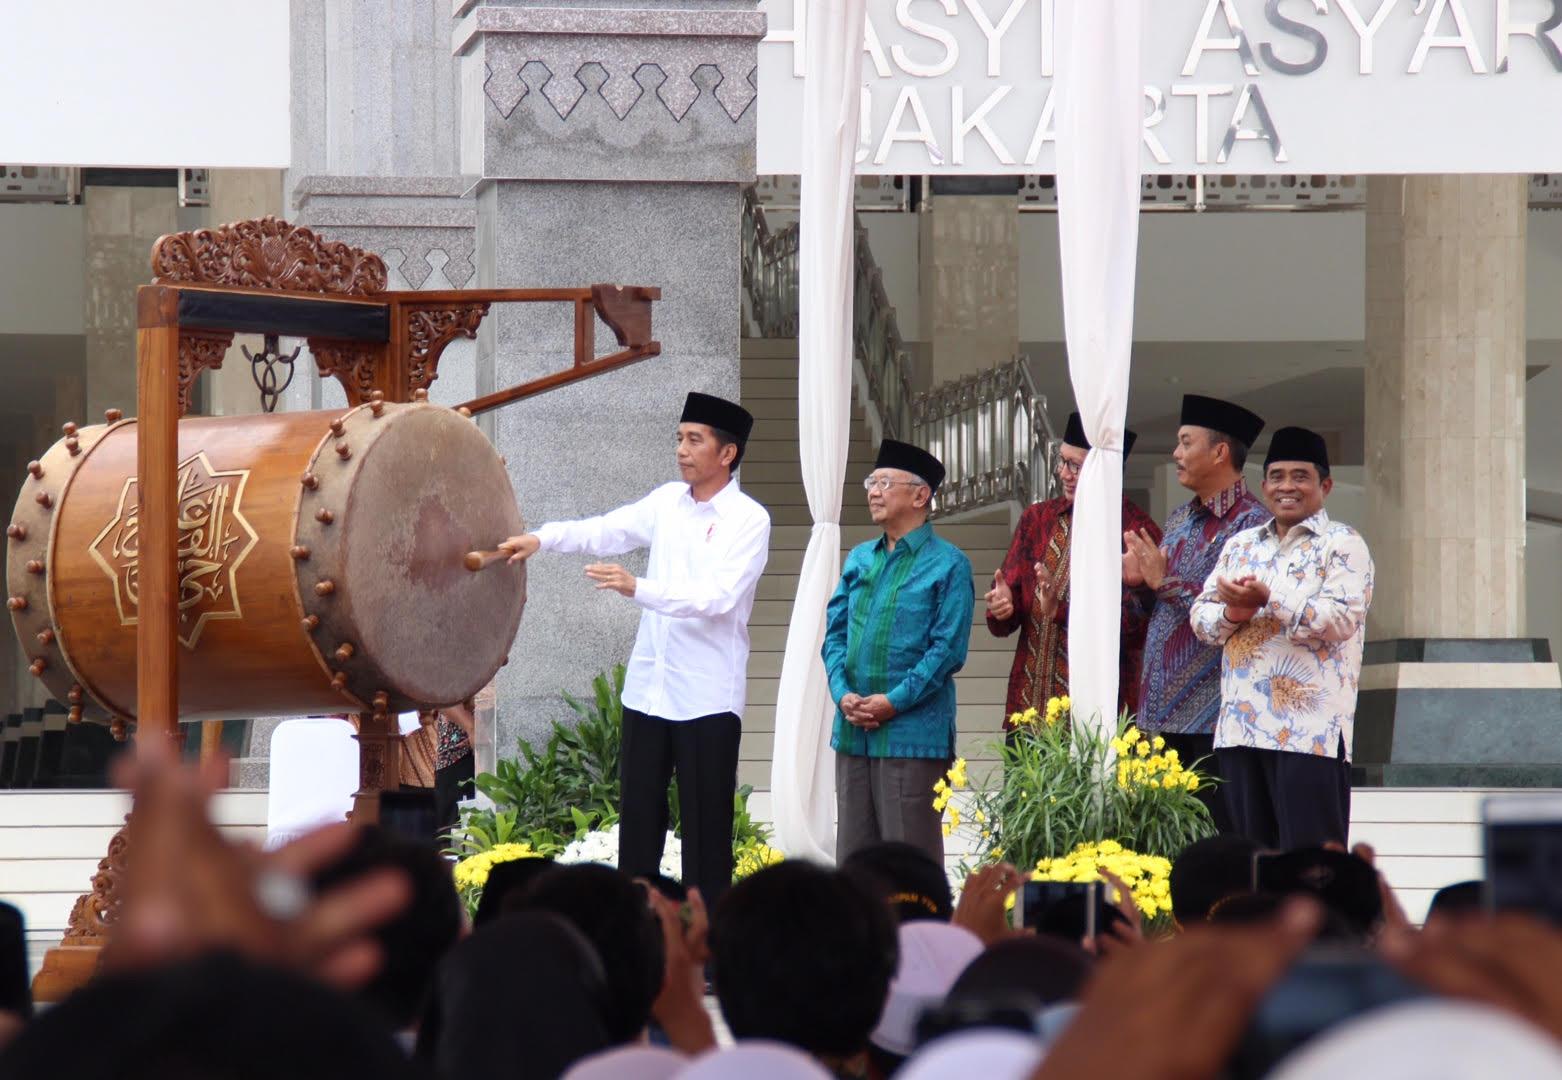 Presiden Jokowi saat memukul beduk tanda Peresmian Masjid Raya K.H. Hasyim Asy'ari, d Jl. Daan Mogot, Jakarta Barat, Sabtu (14/4). (Foto: Humas/Nia)